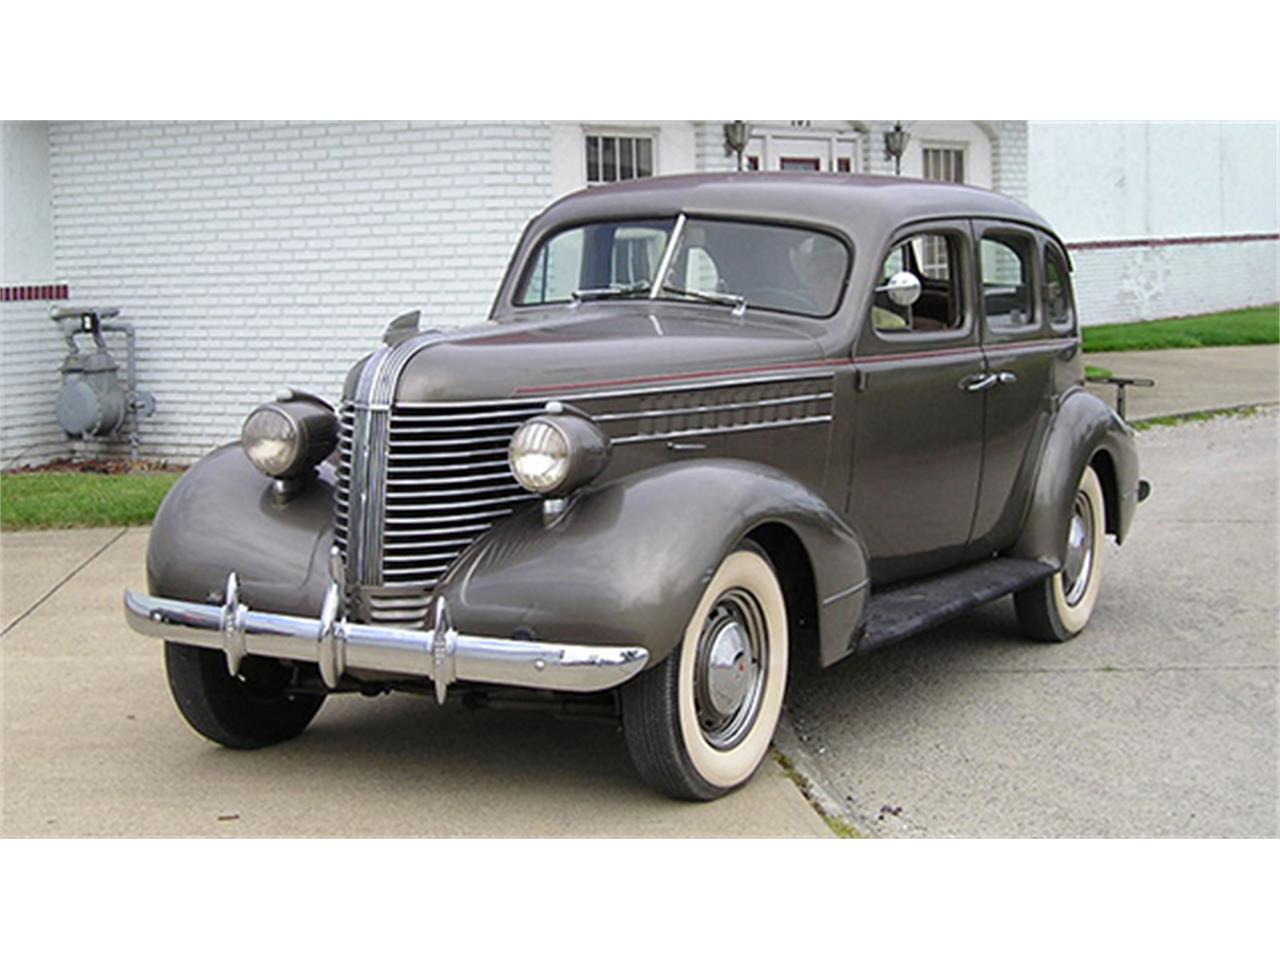 1938 Pontiac Series 28 Deluxe Four Door Touring Sedan For Sale